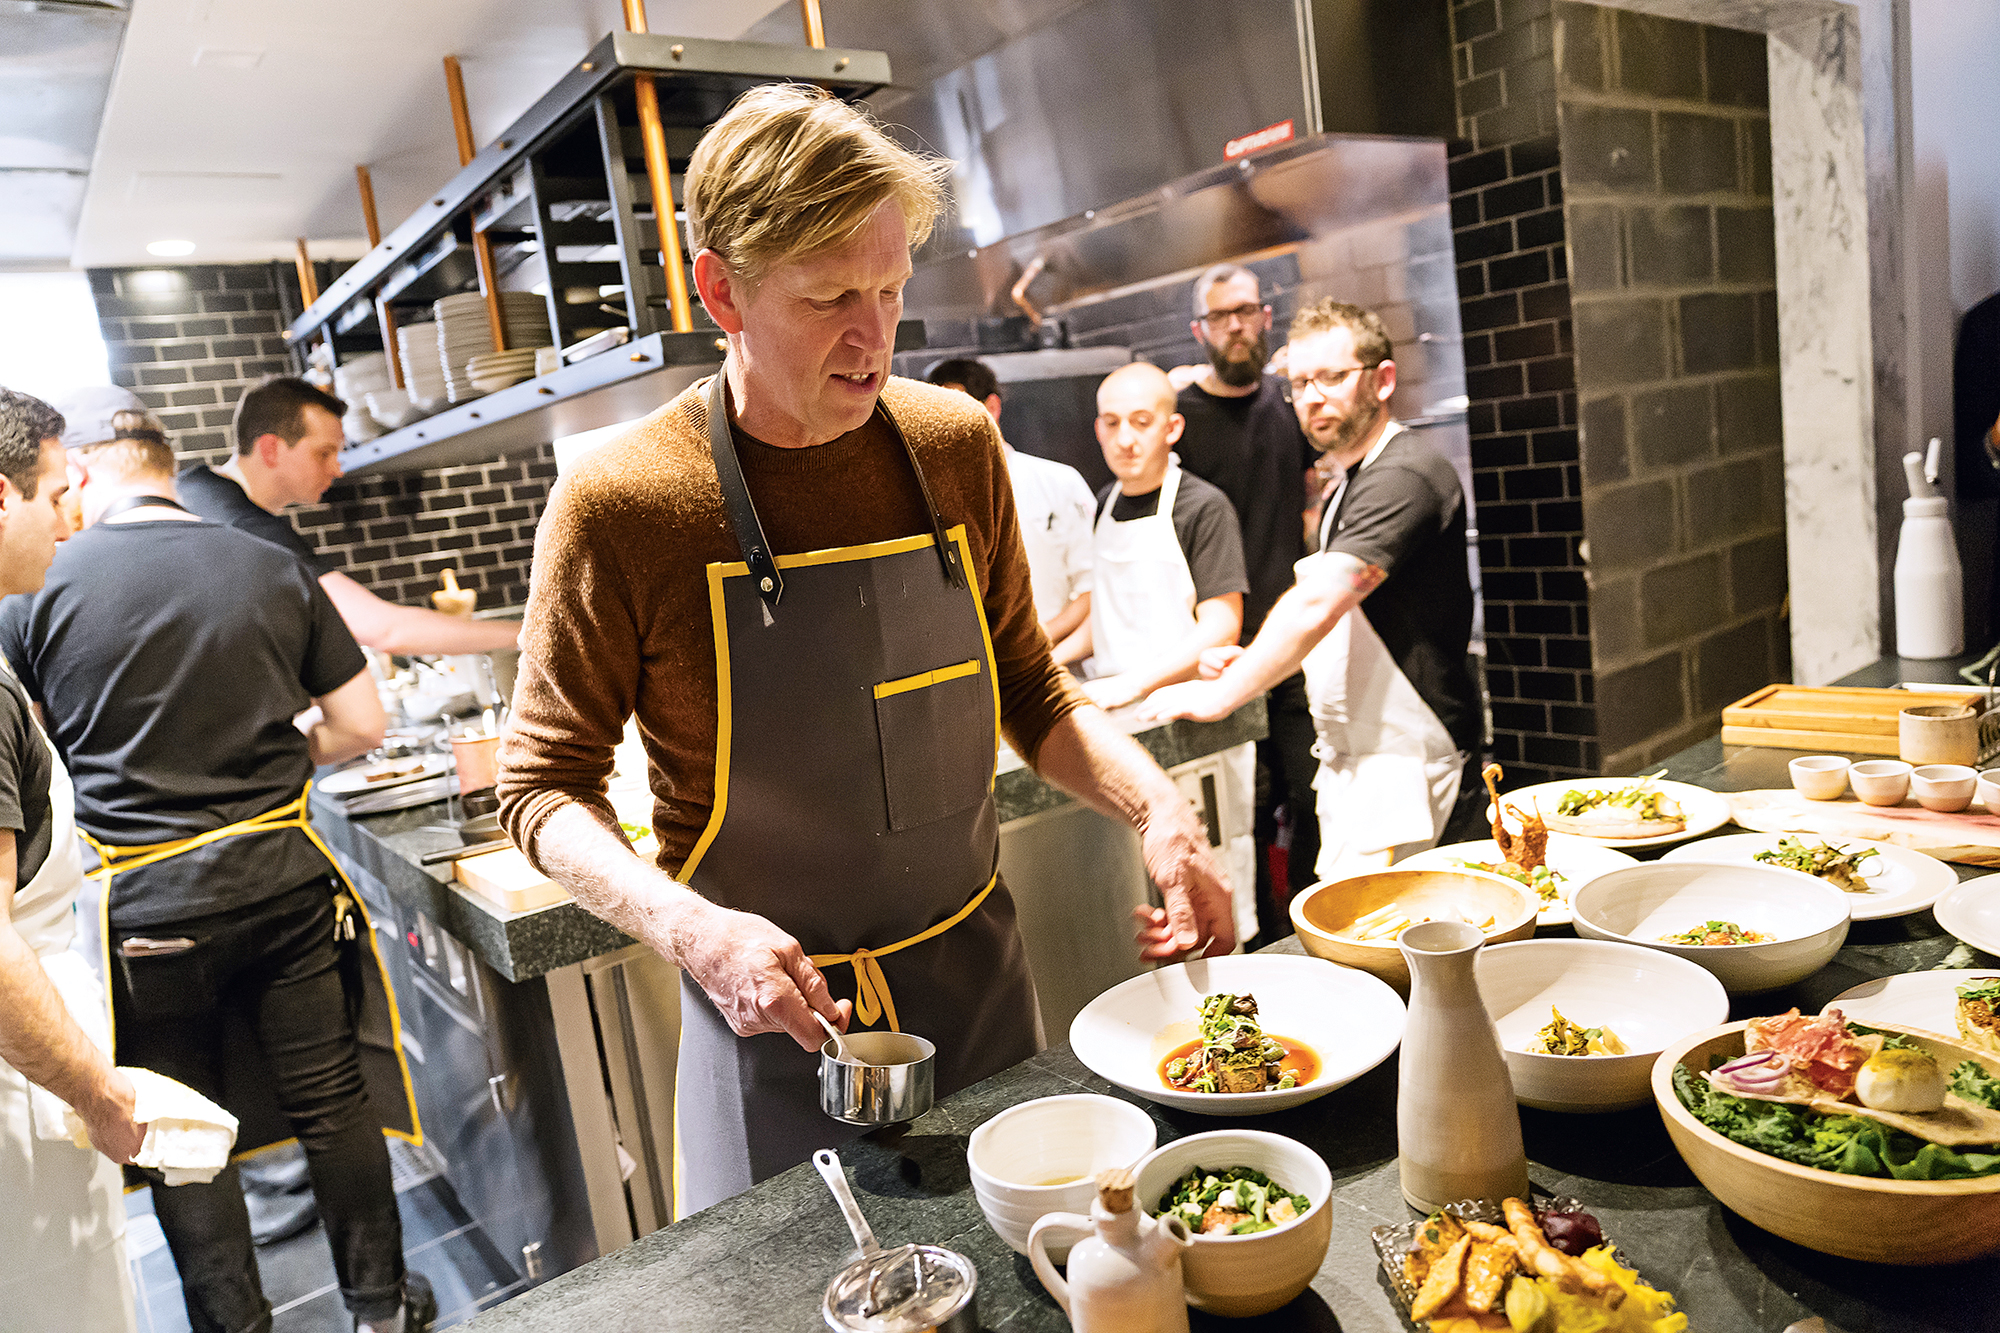 Spike Gjerde in the kitchen at A Rake's Progress. Photograph by Scott Suchman.